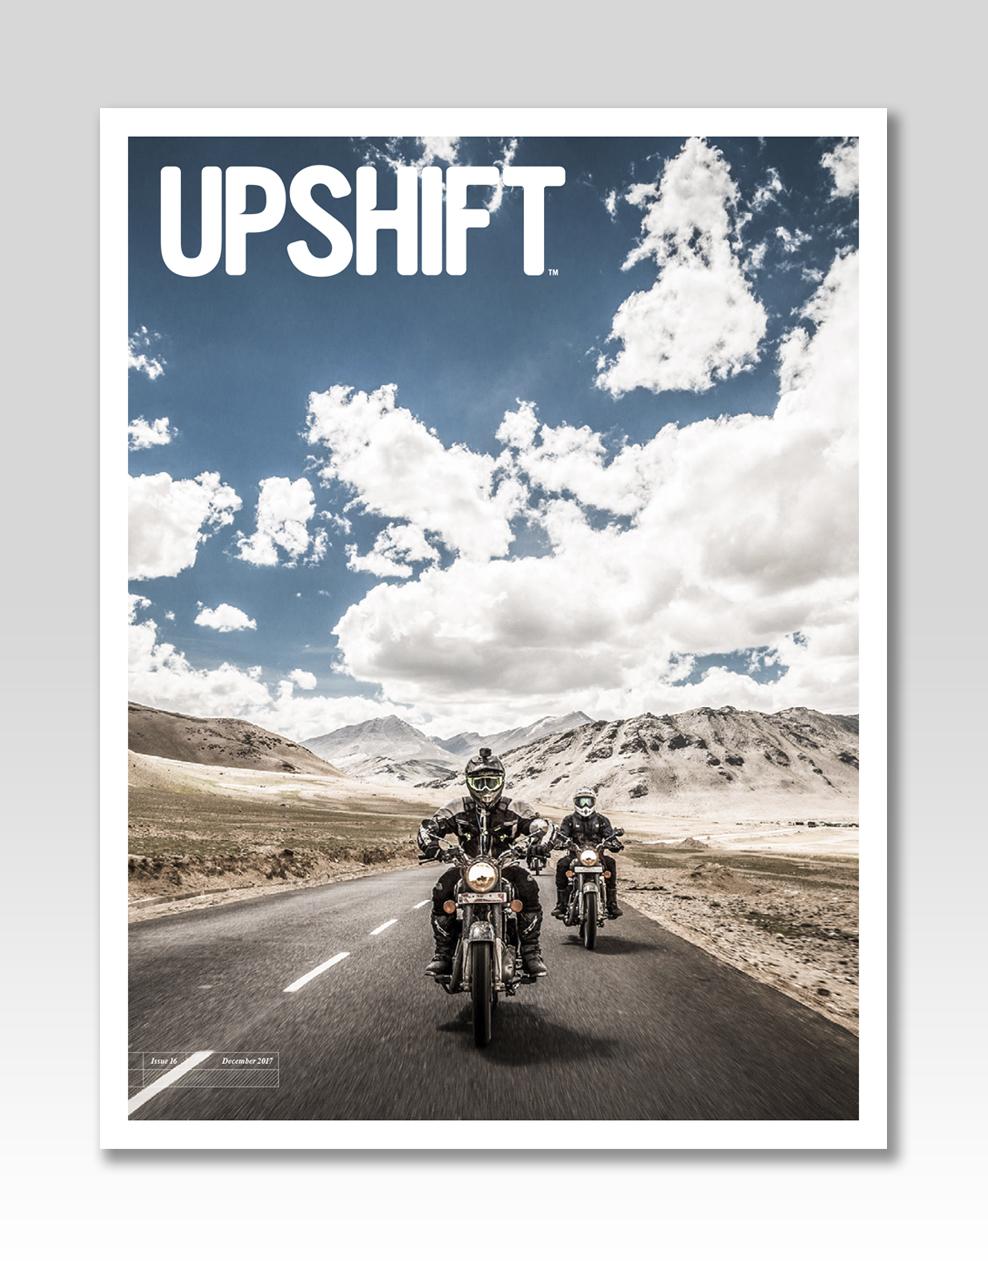 UPSHIFT 16.jpg